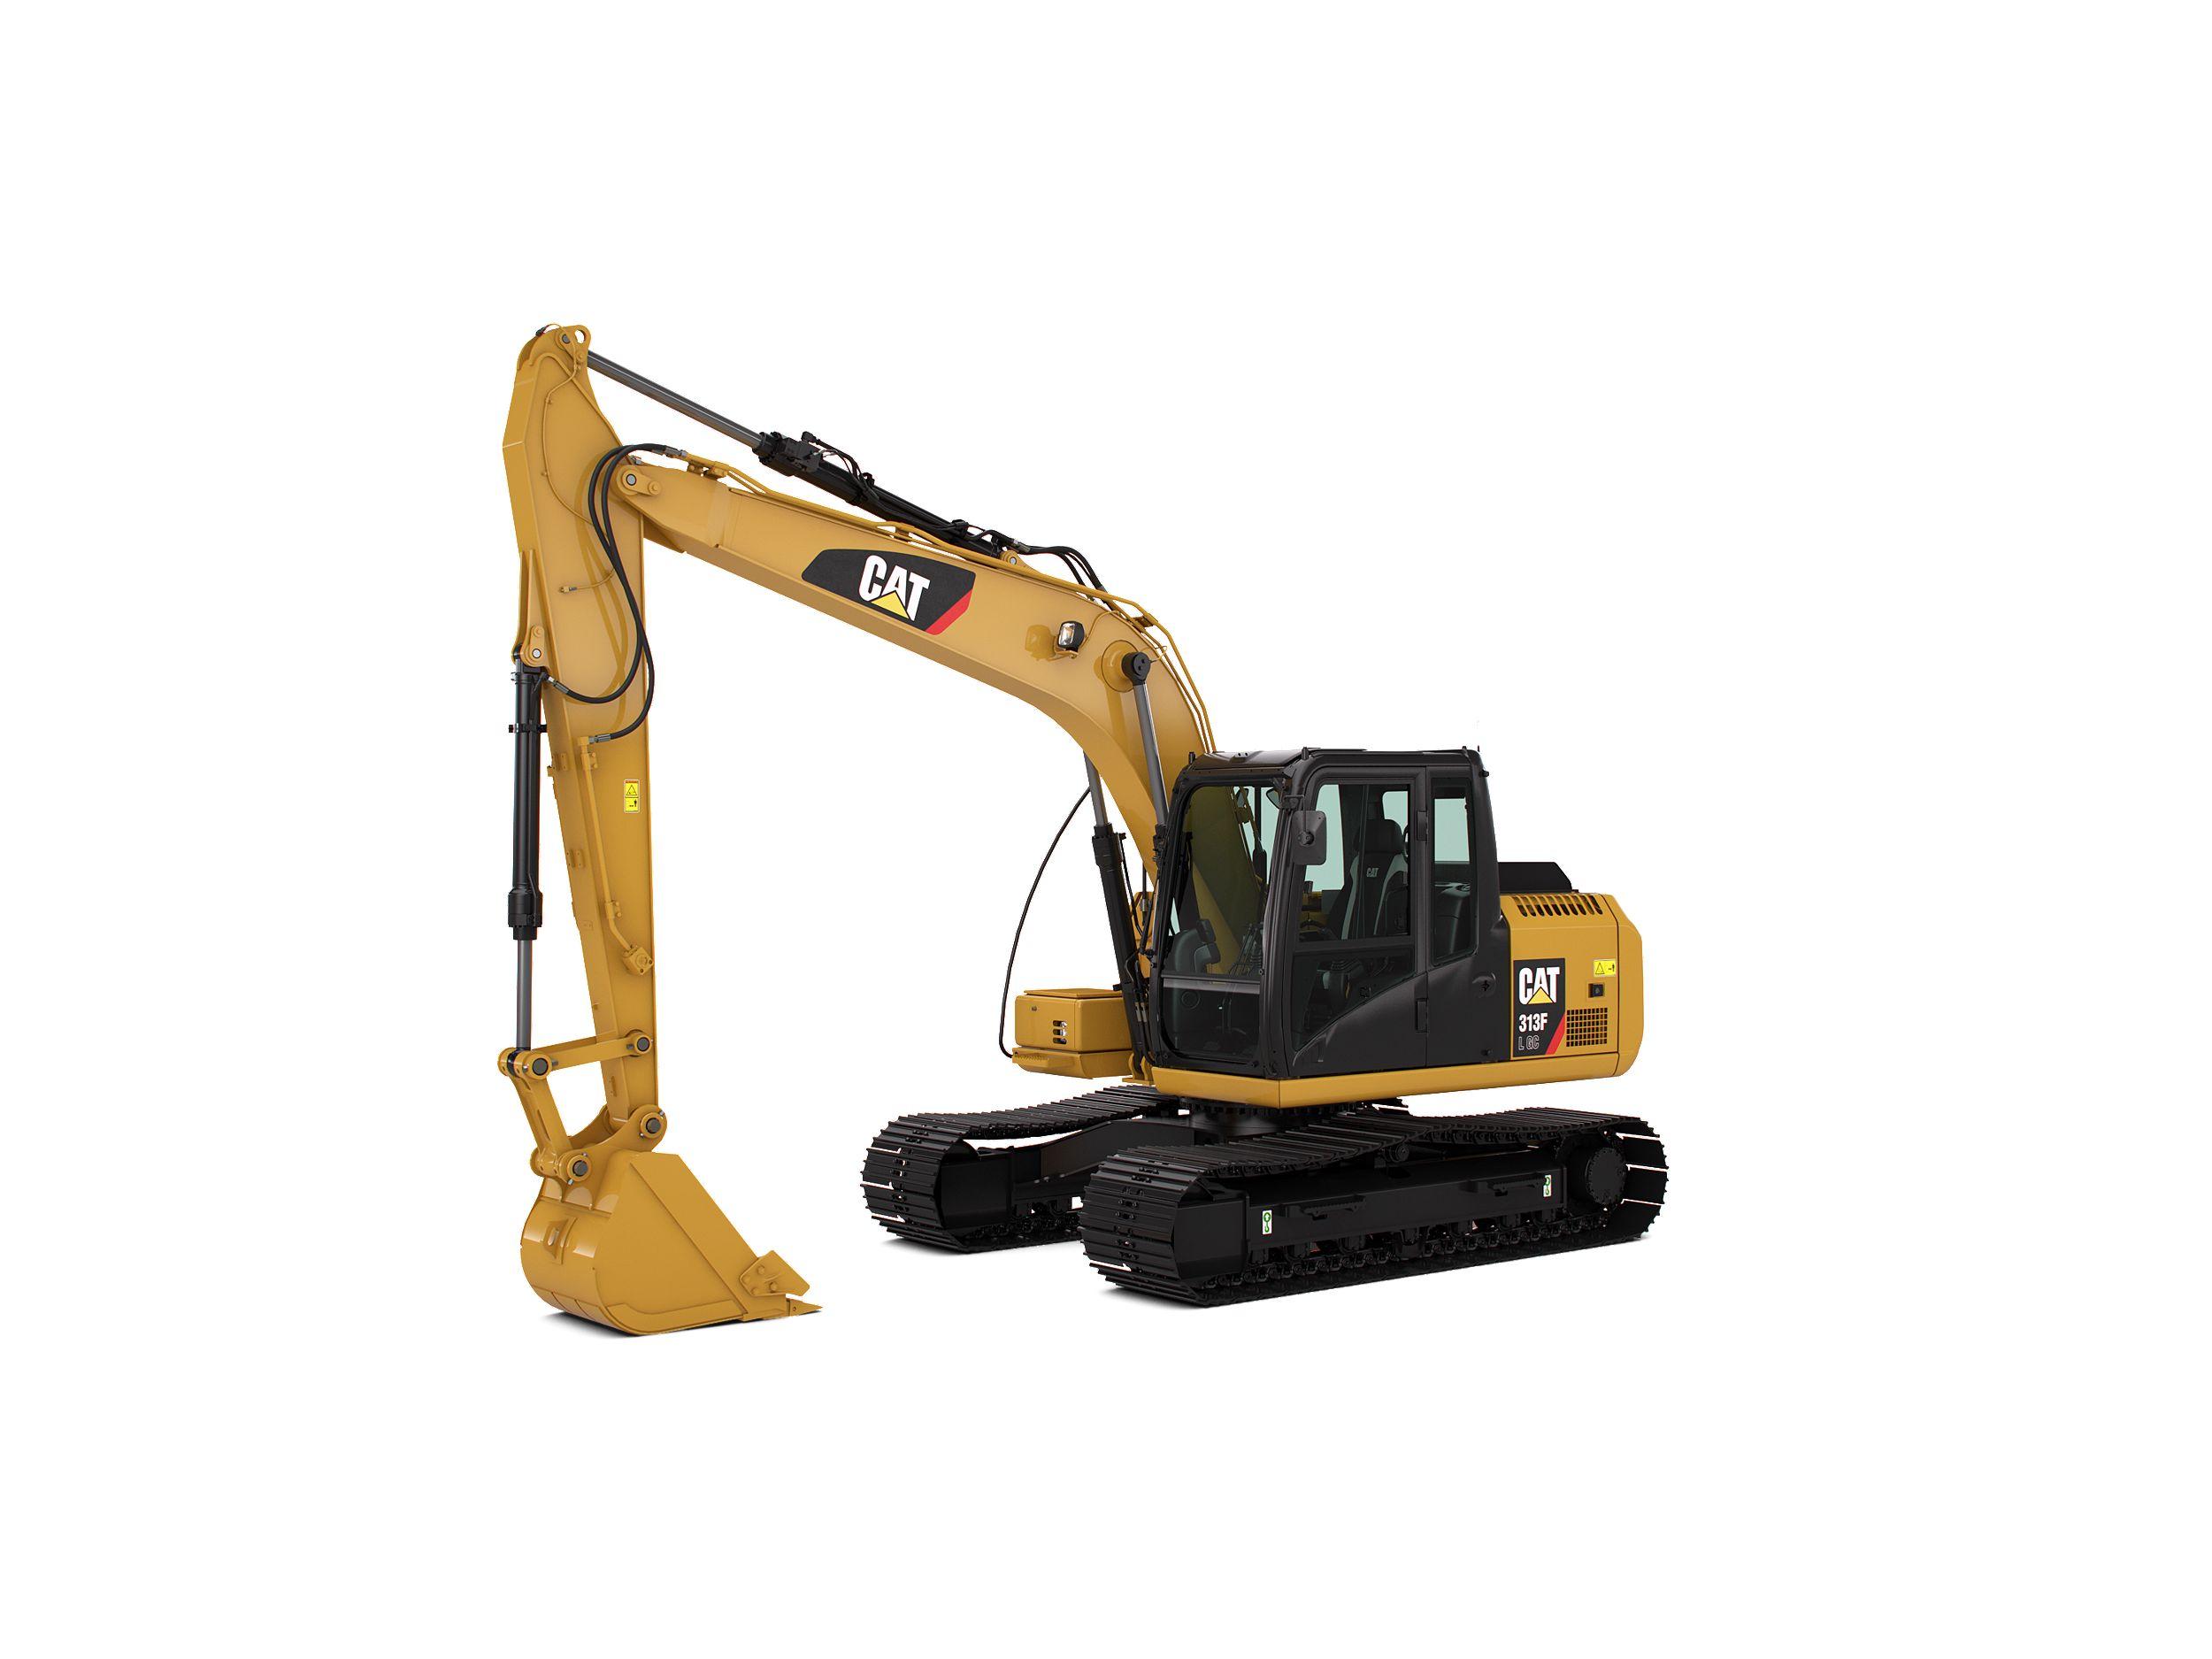 313F GC Hydraulic Excavator marketing ready geometry